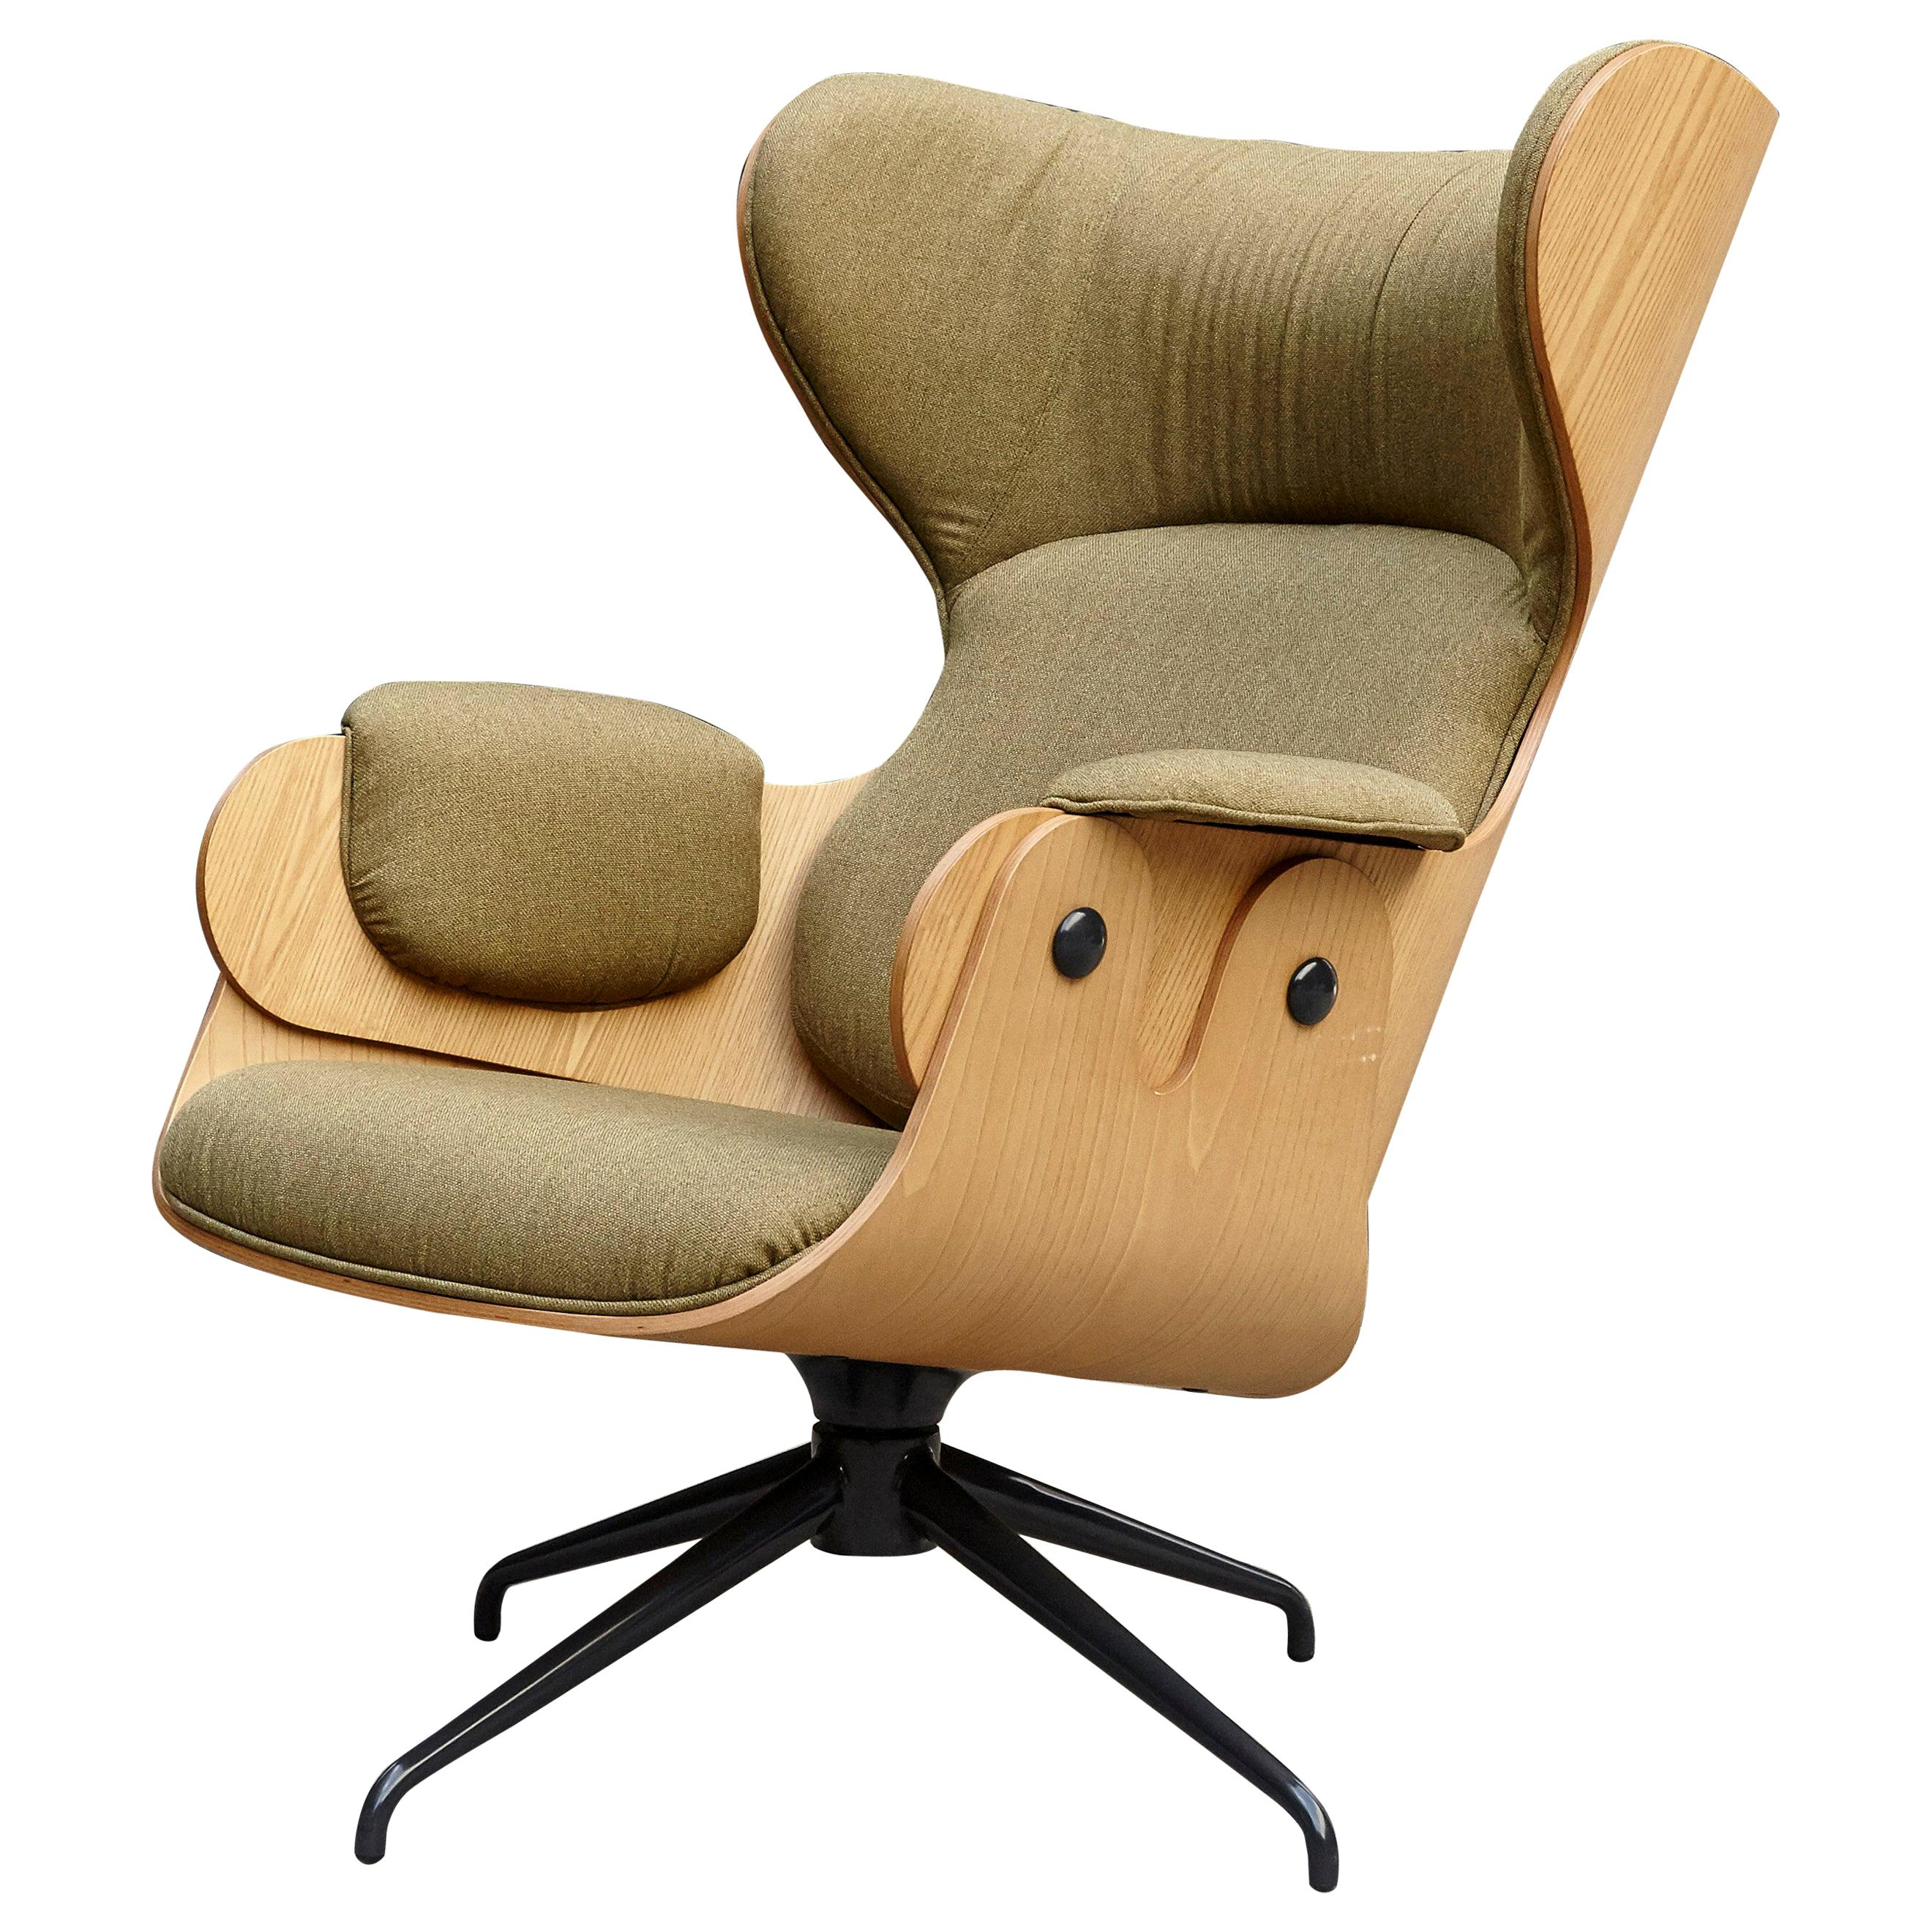 Jaime Hayon, Contemporary, Playwood Walnut Green Upholstery Lounger Armchair